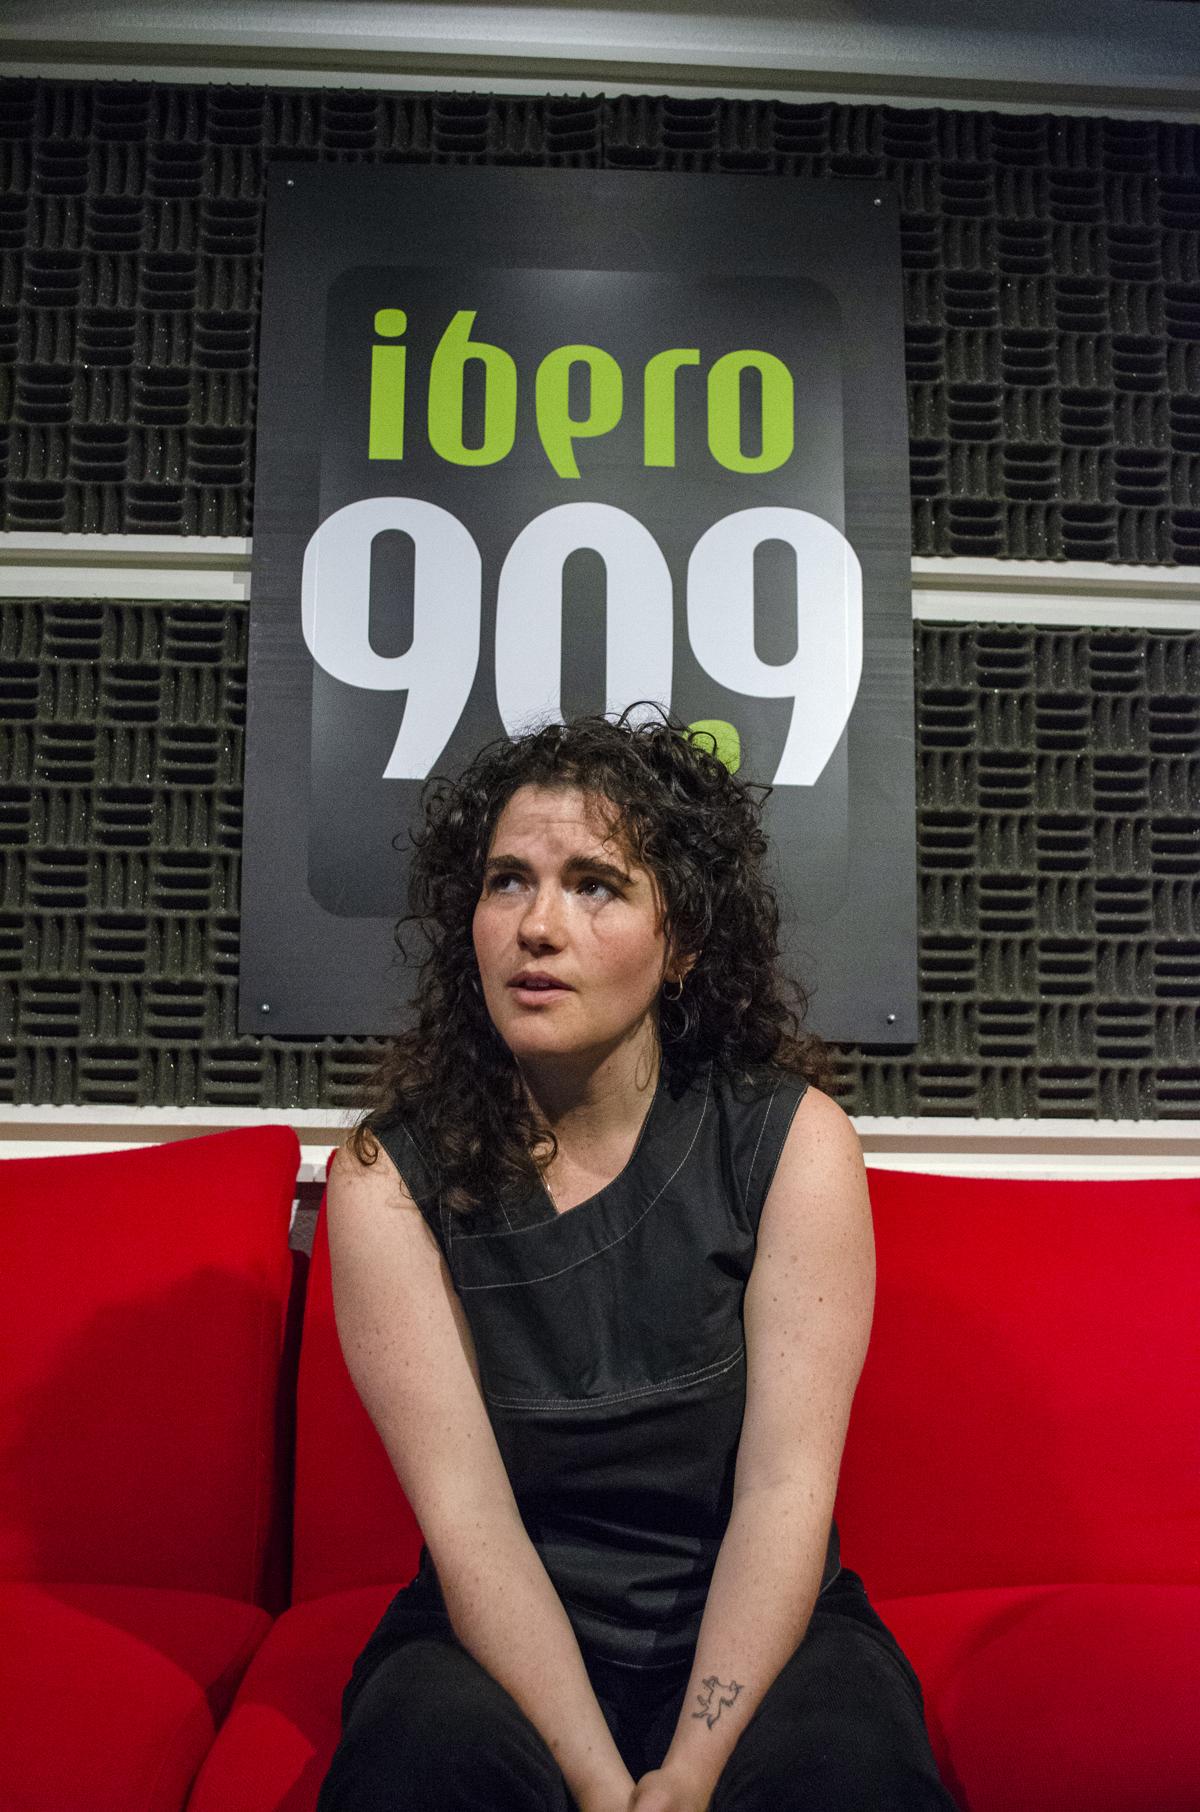 Foto: Esteban A. Catalán | Ibero 90.9